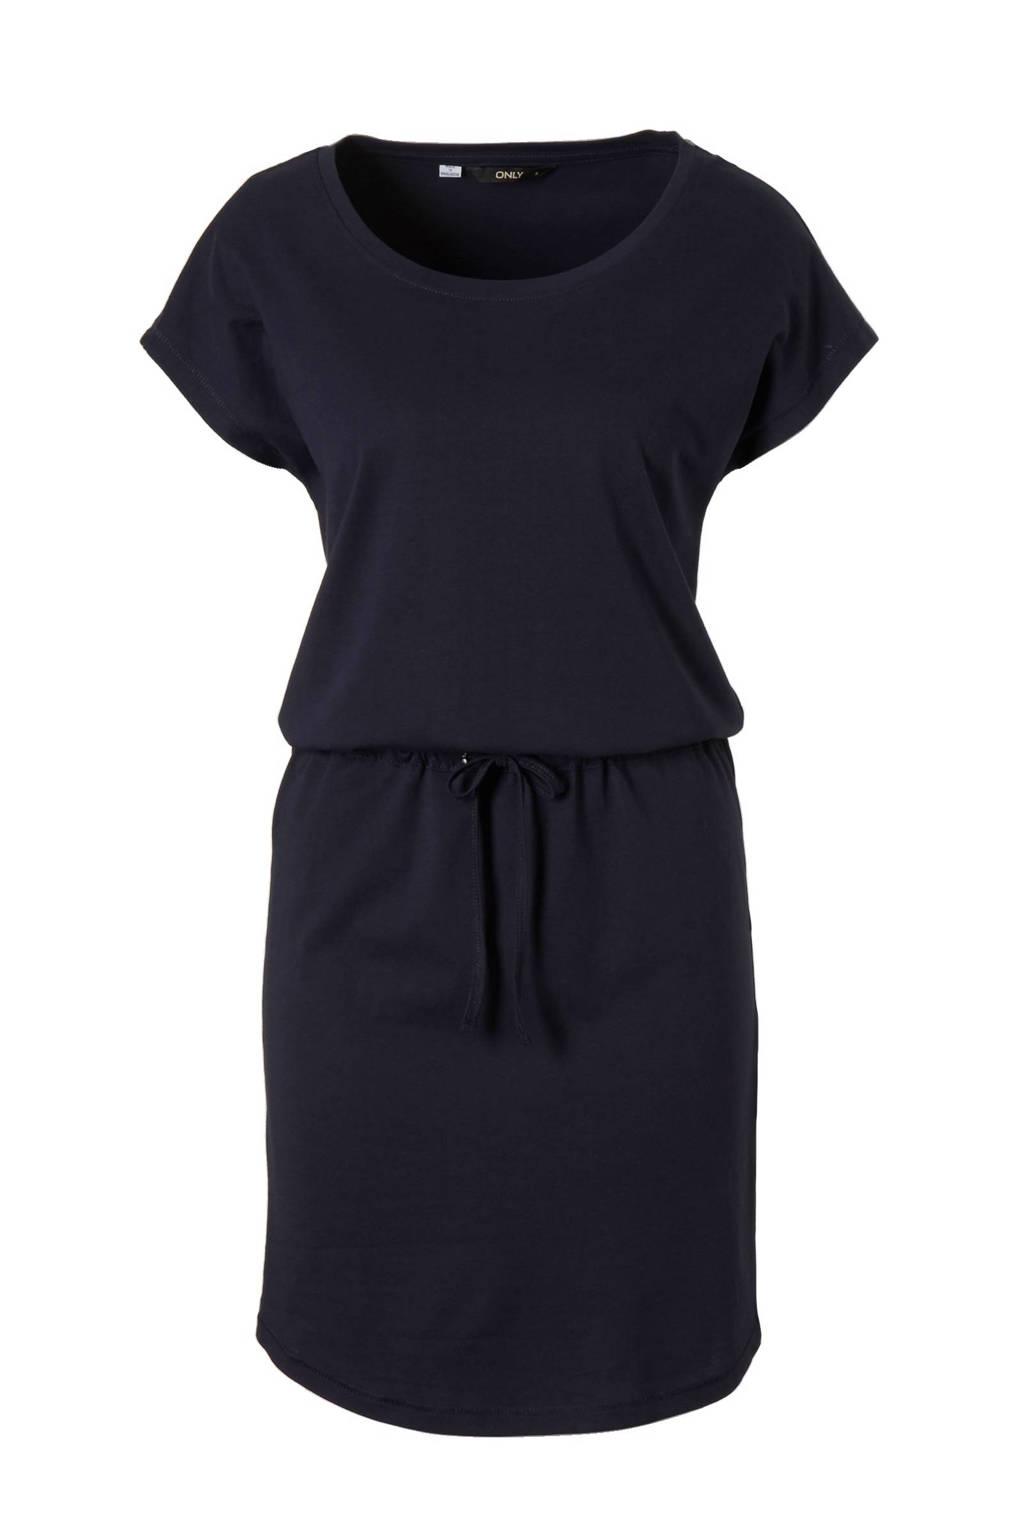 ONLY jurk, Donkerblauw